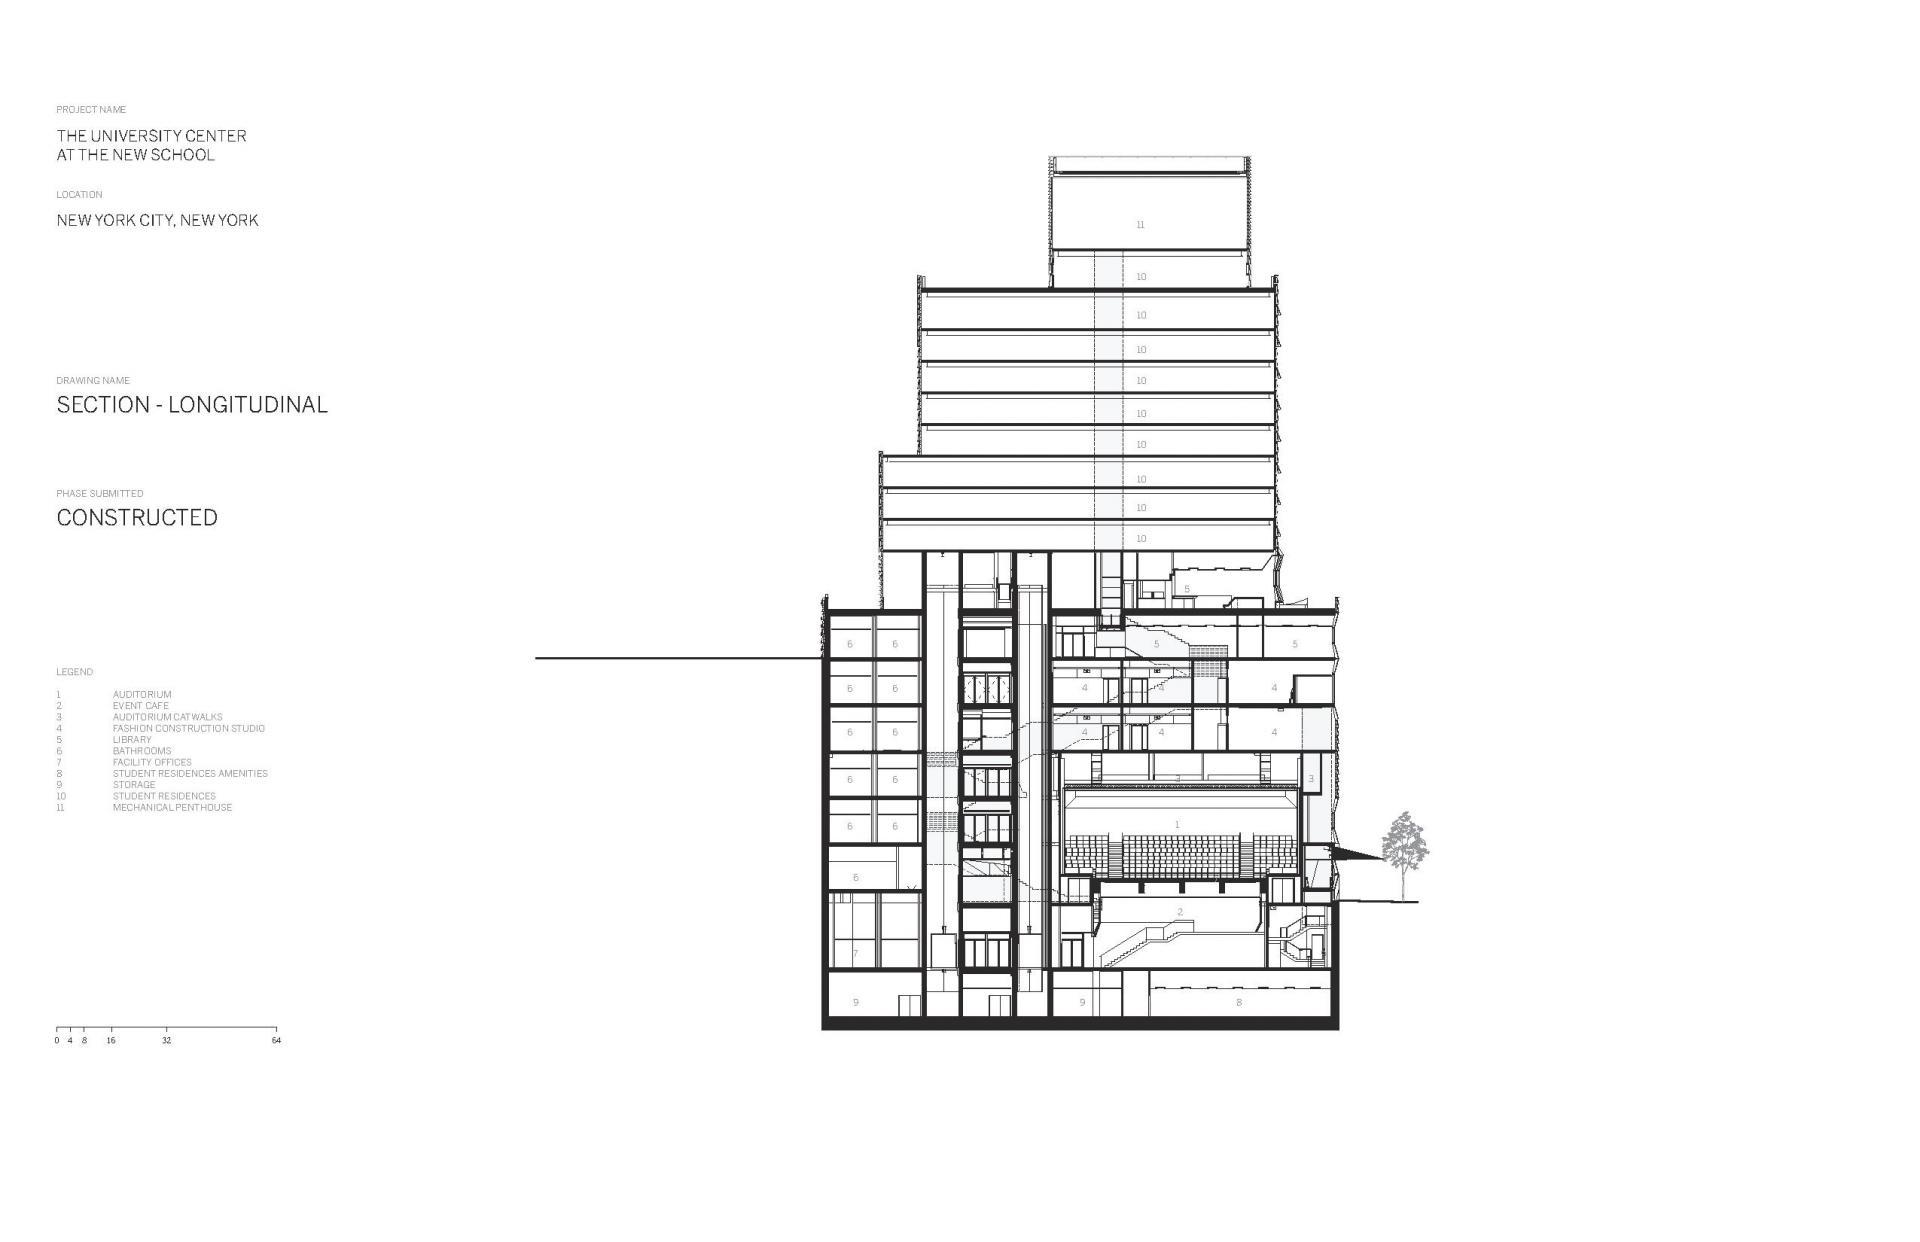 Схема учебного центра Greenwich Village в Нью Йорке - Фото 11